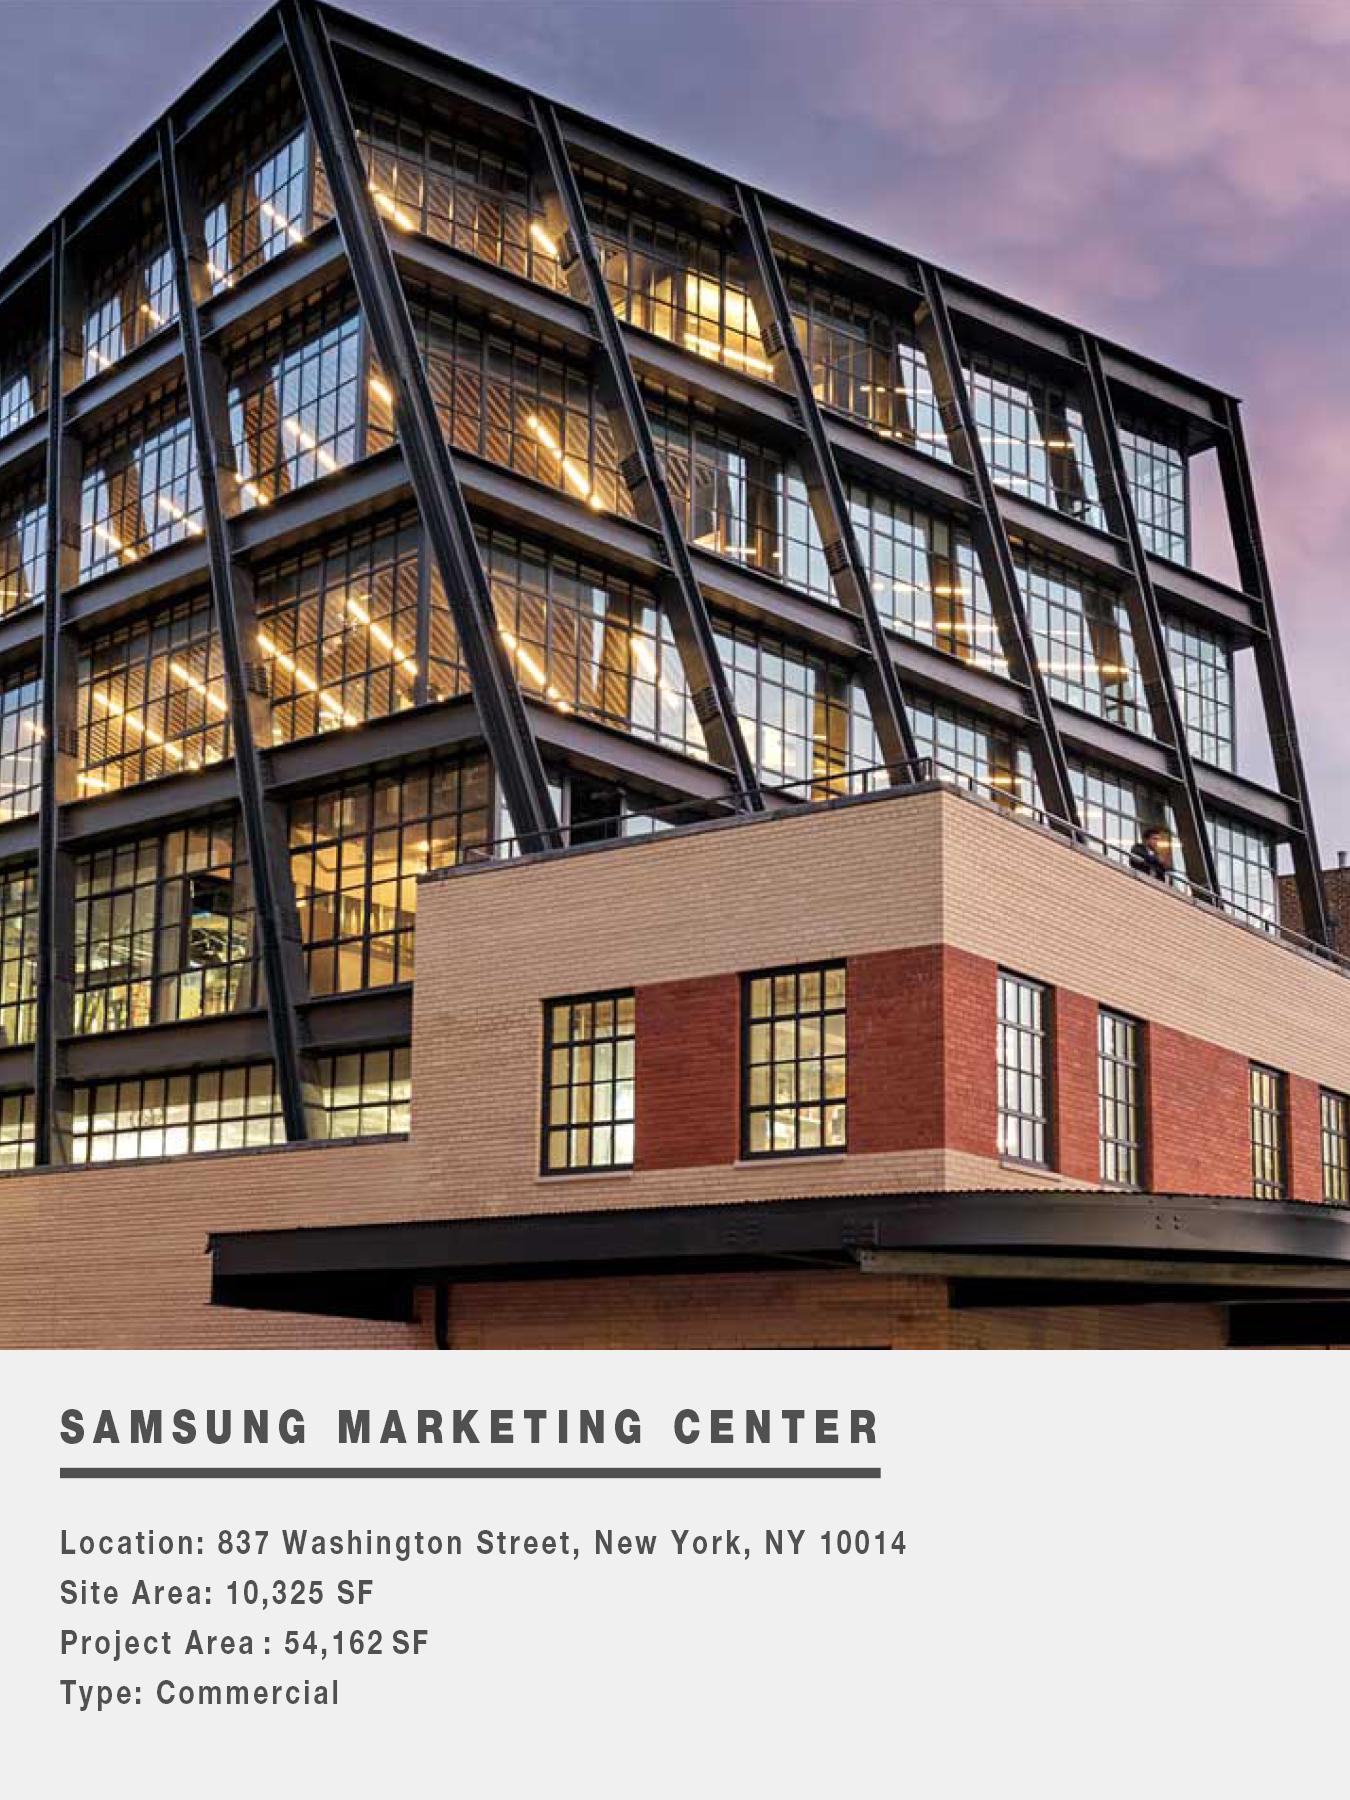 SAMSUNG MARKETING CENTER